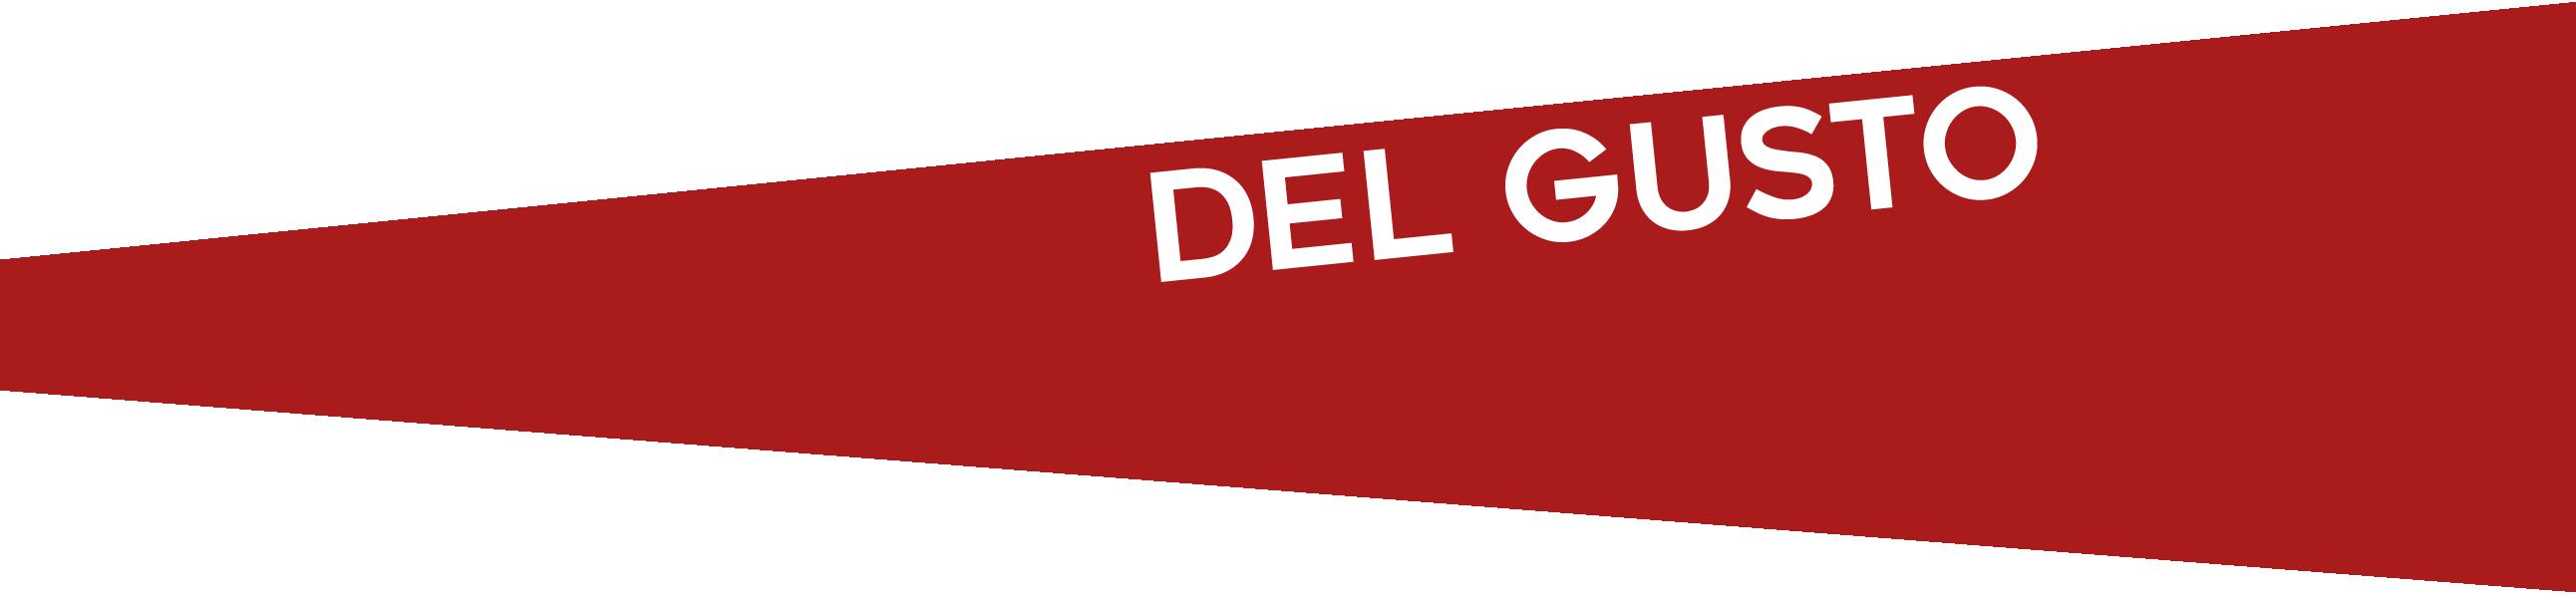 vie-cover-home-01